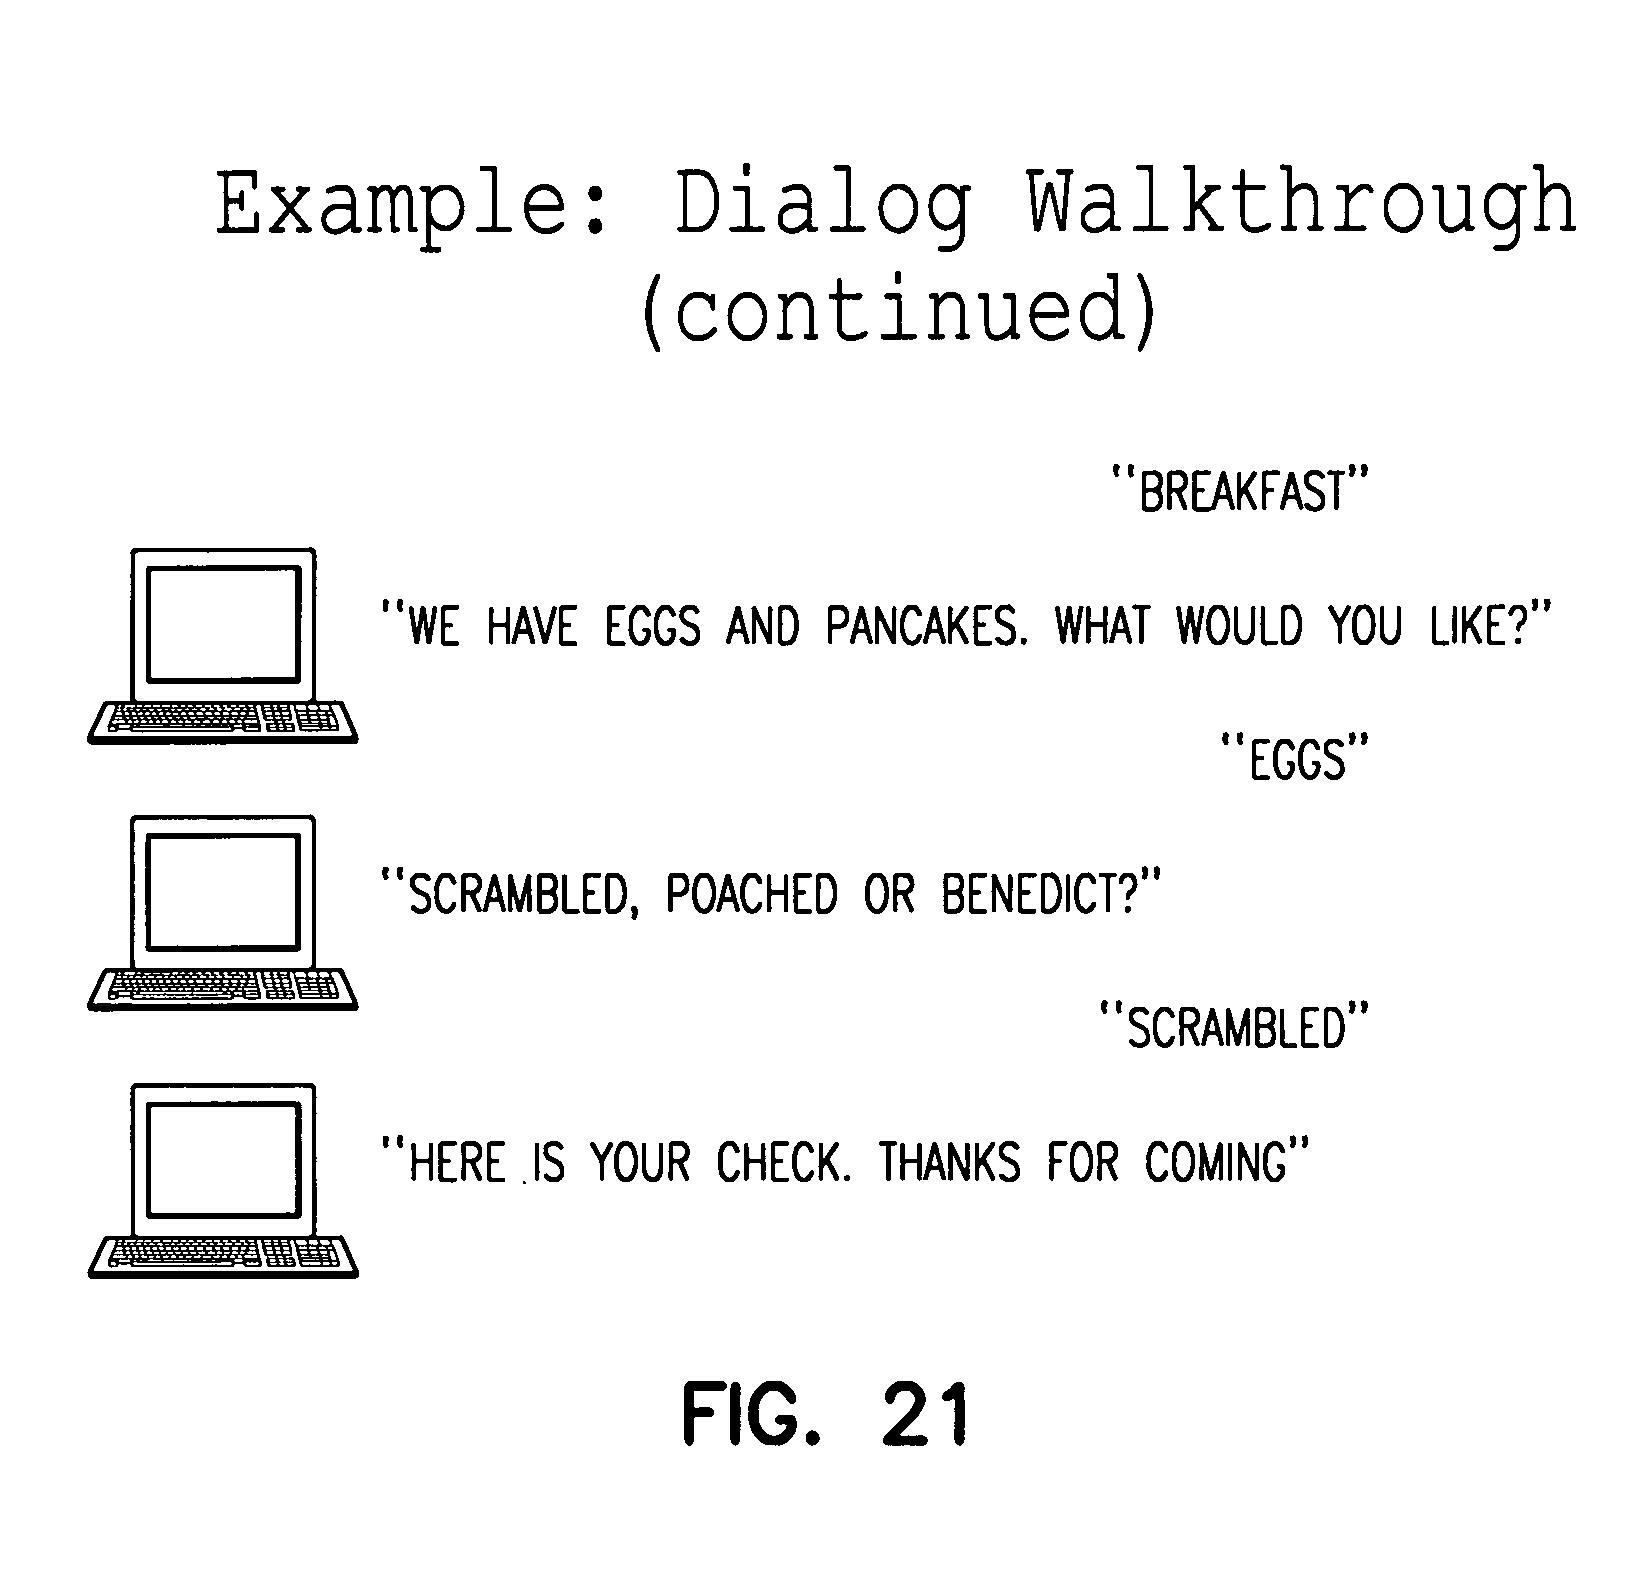 Patent US 7,539,656 B2